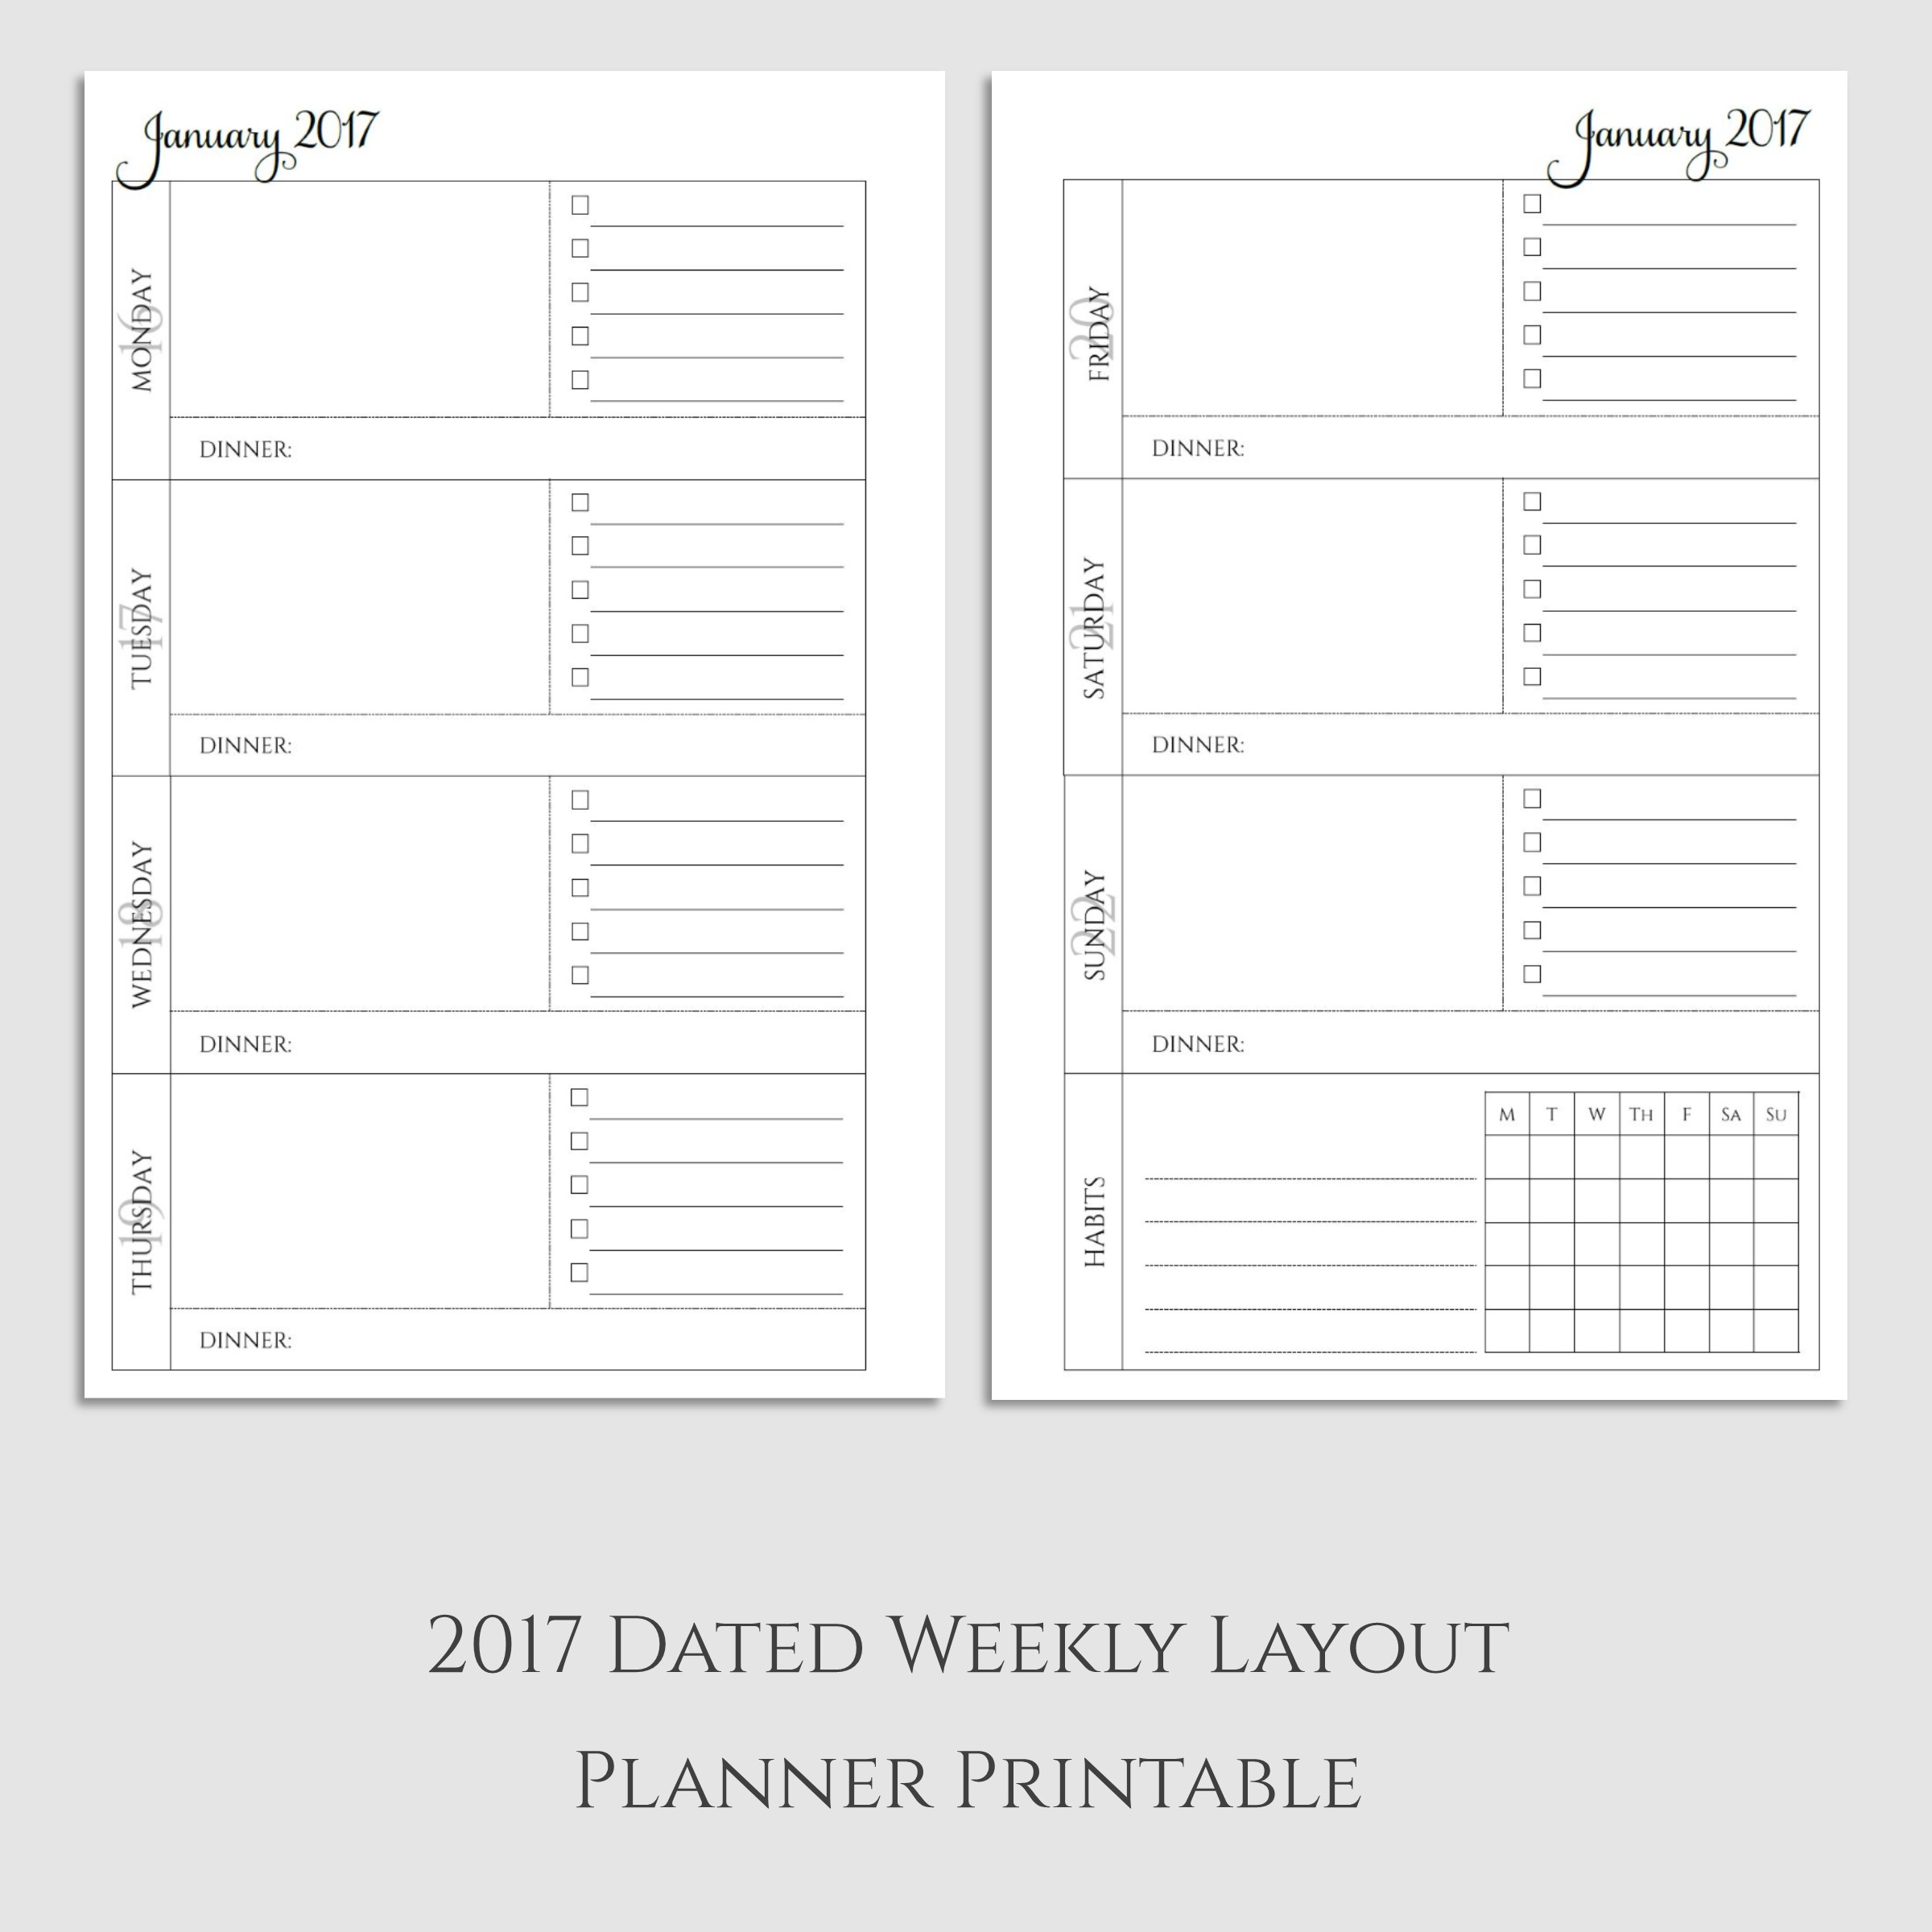 2017 Weekly Planner Printable with Dinner & Habit Tracker - Sarcasm ...